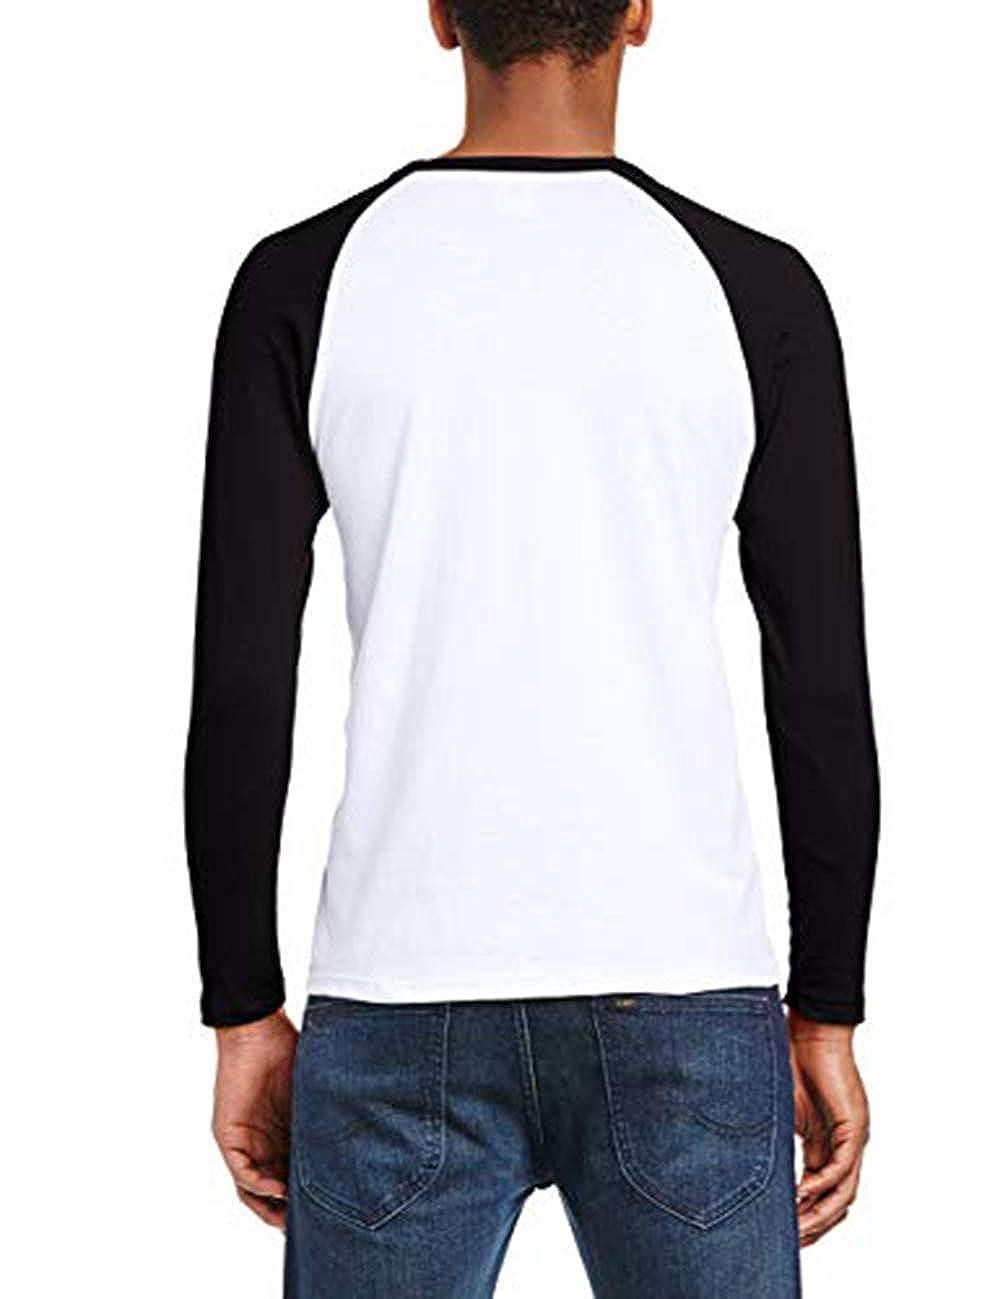 Yestrong Men Graphic of MGMT Long Sleeve Raglan Tee Shirt